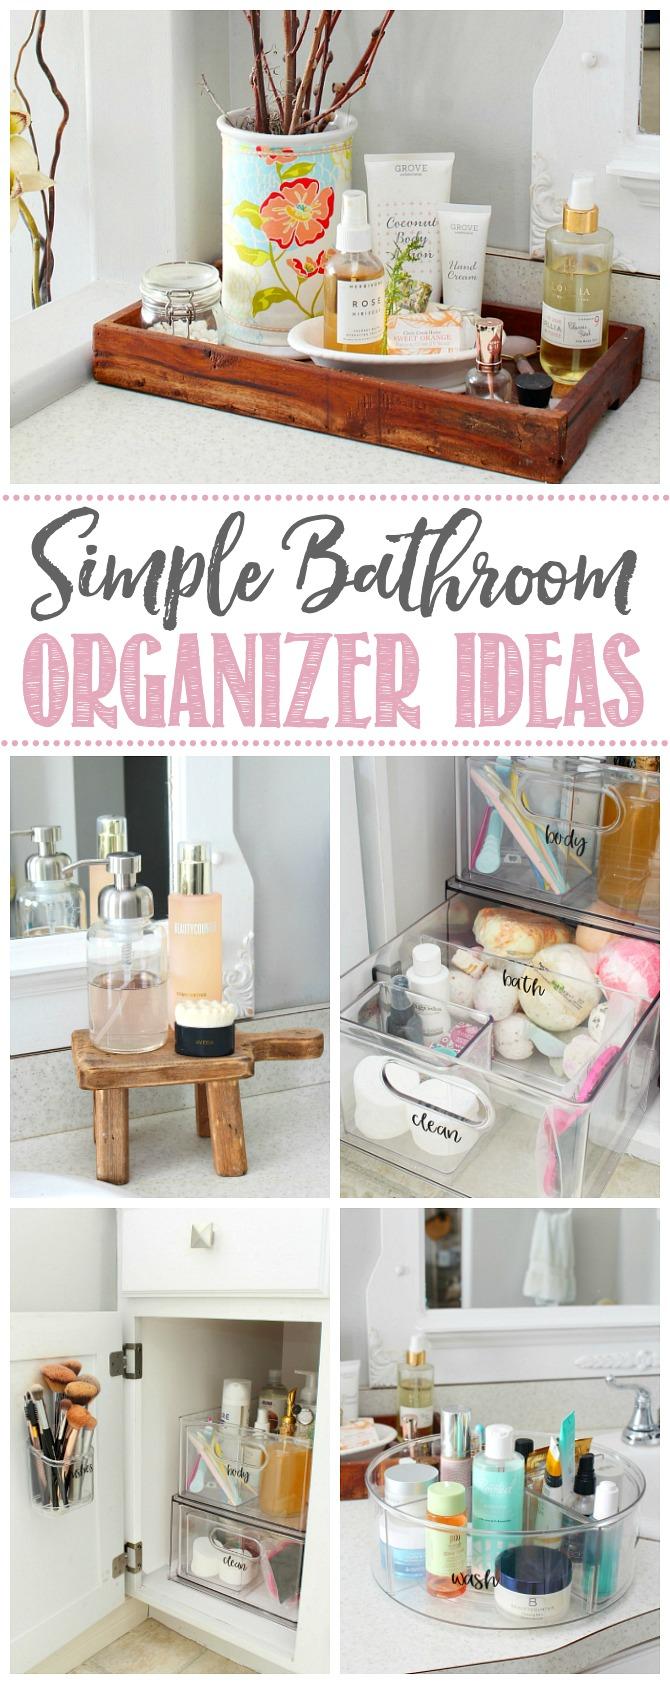 Collage of simple bathroom organizer ideas.